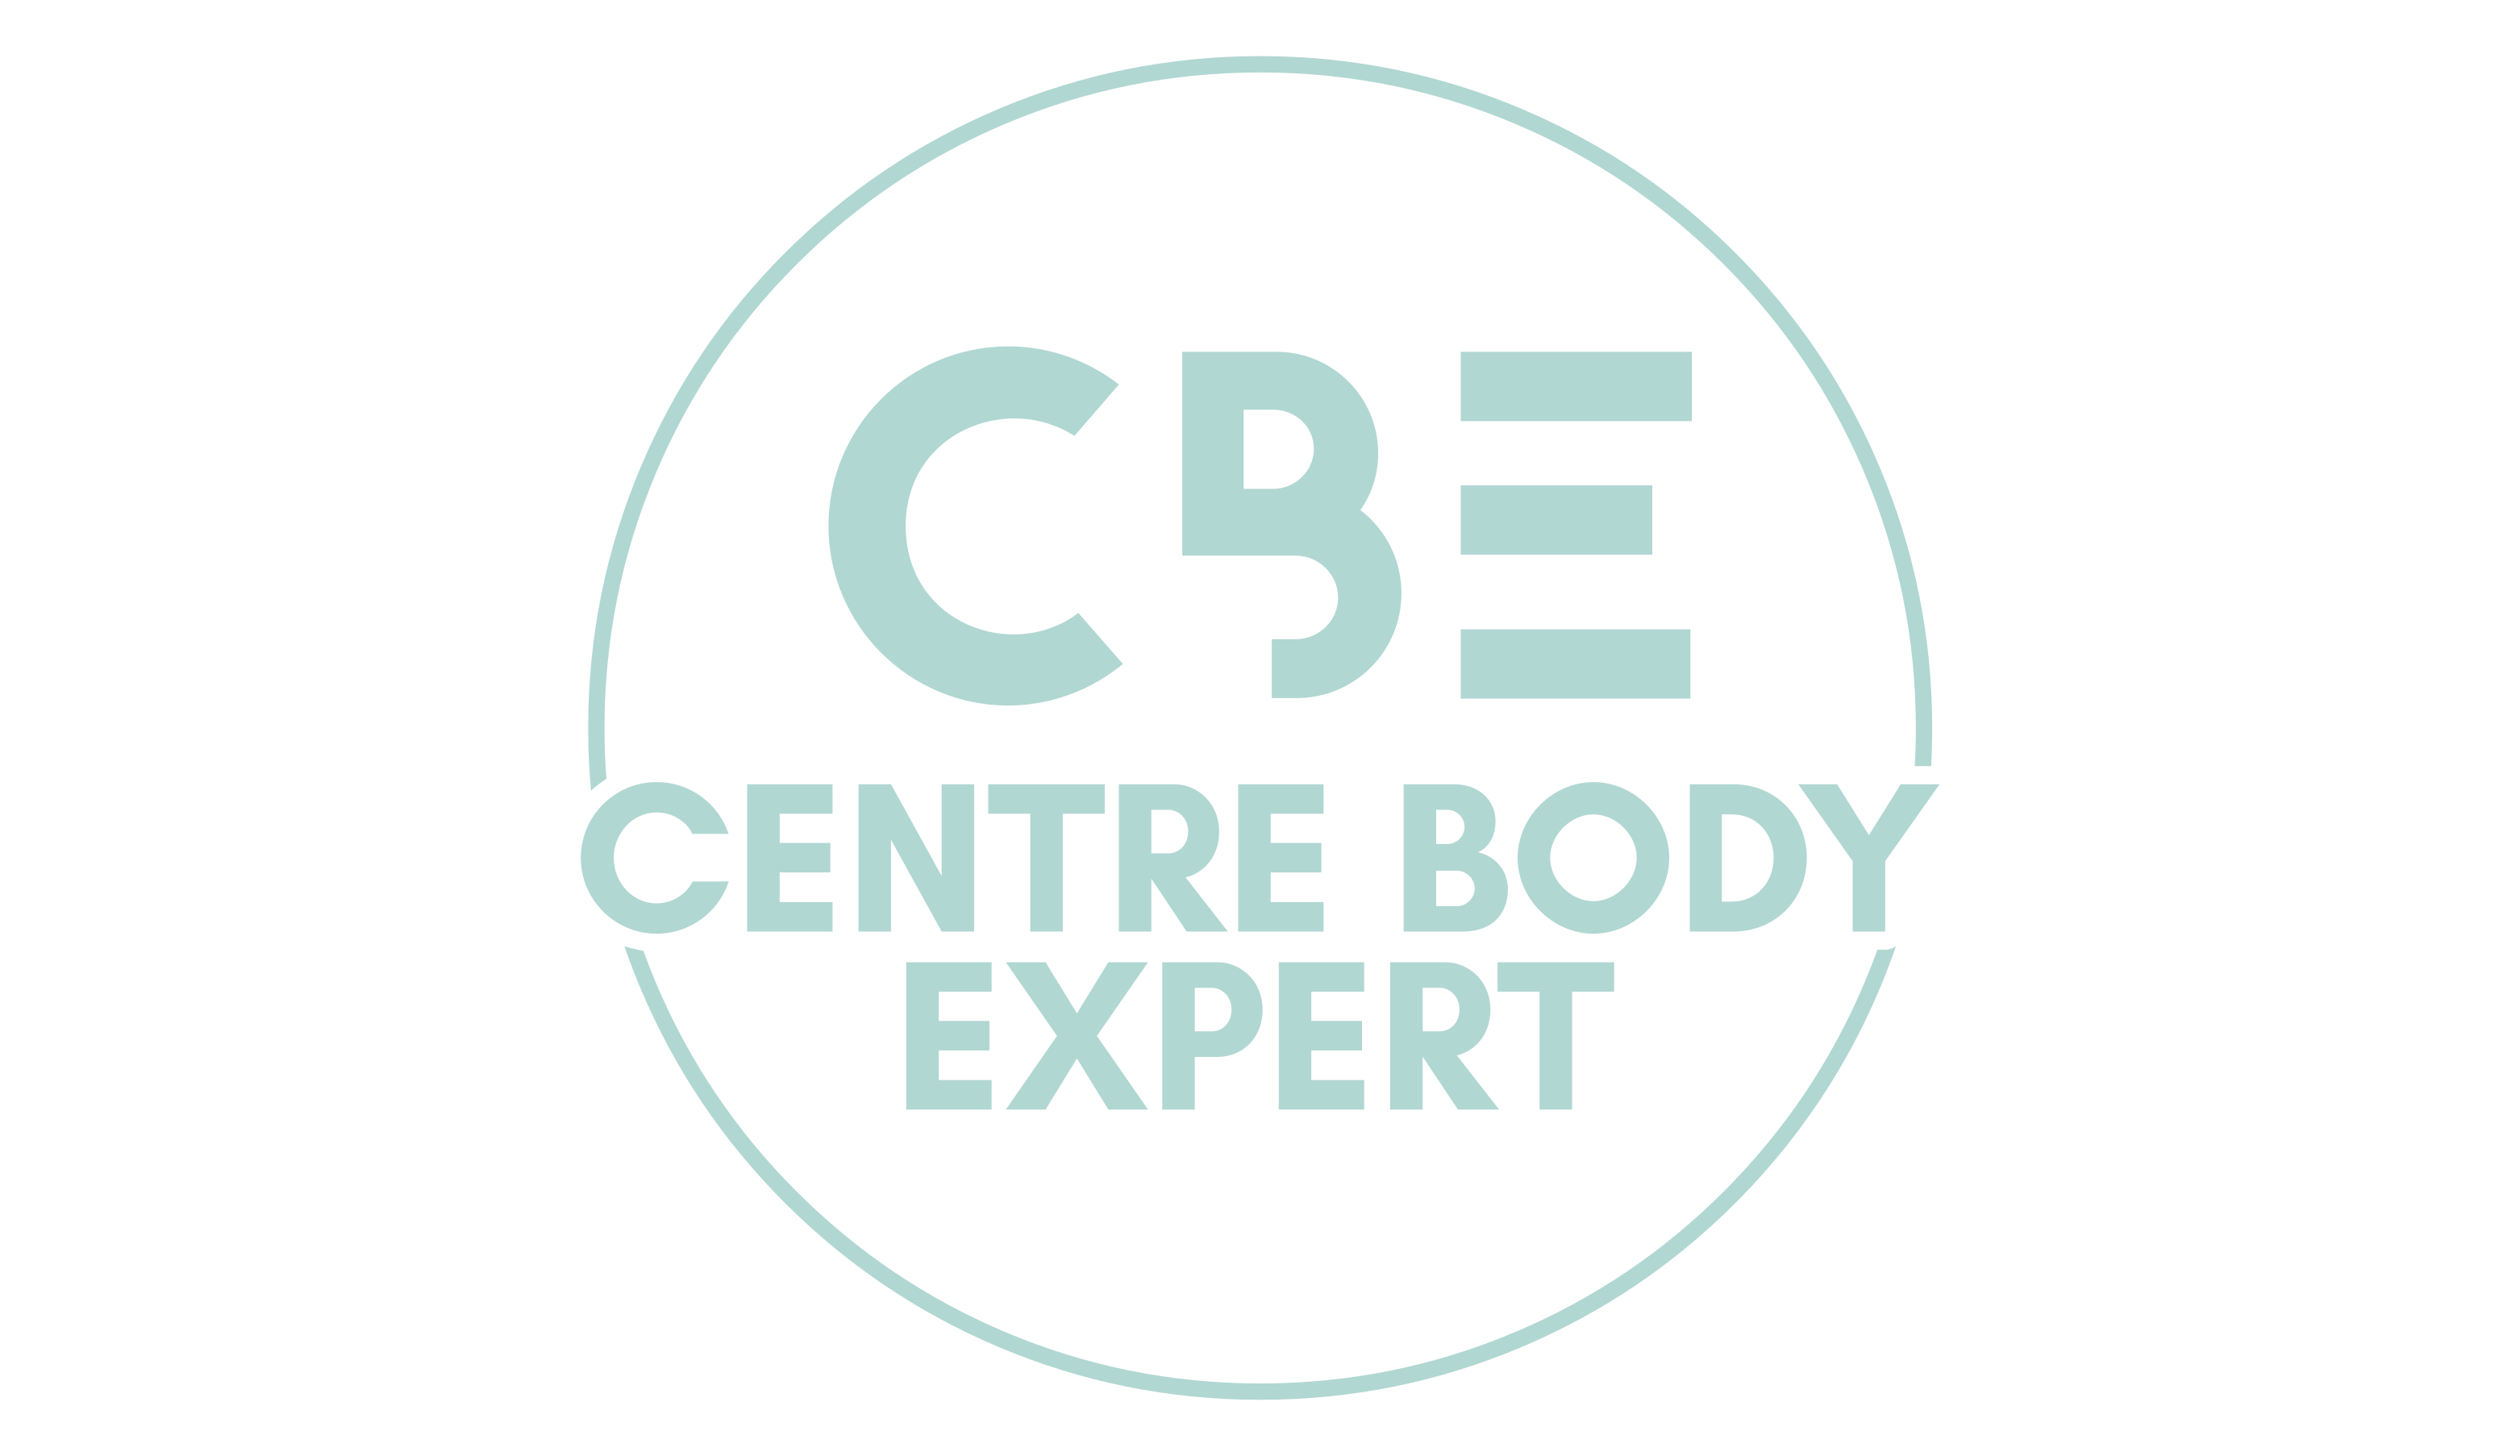 Centre Body Expert